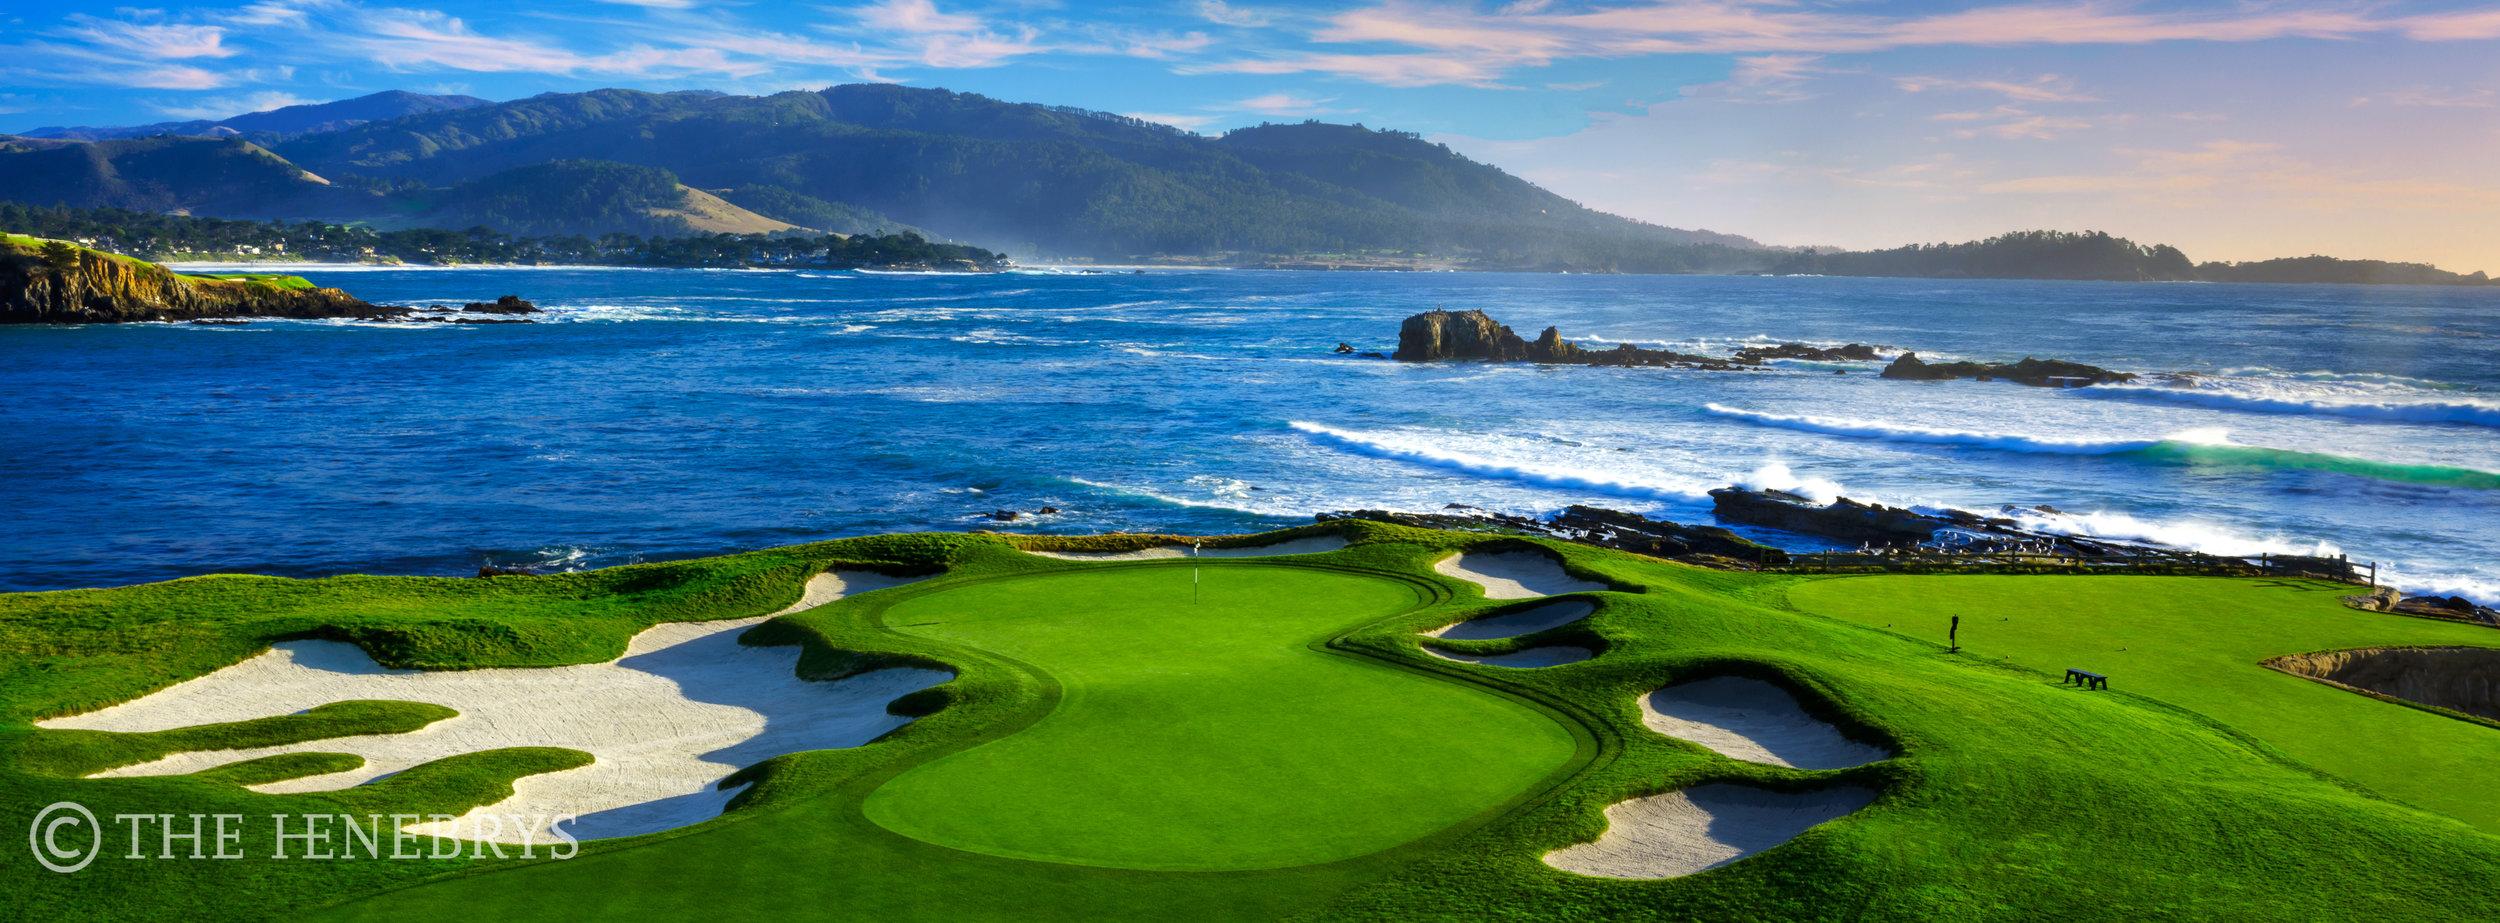 "Pebble Beach Golf Links® #17 ""Stillwater Cove"", Pebble Beach, California"